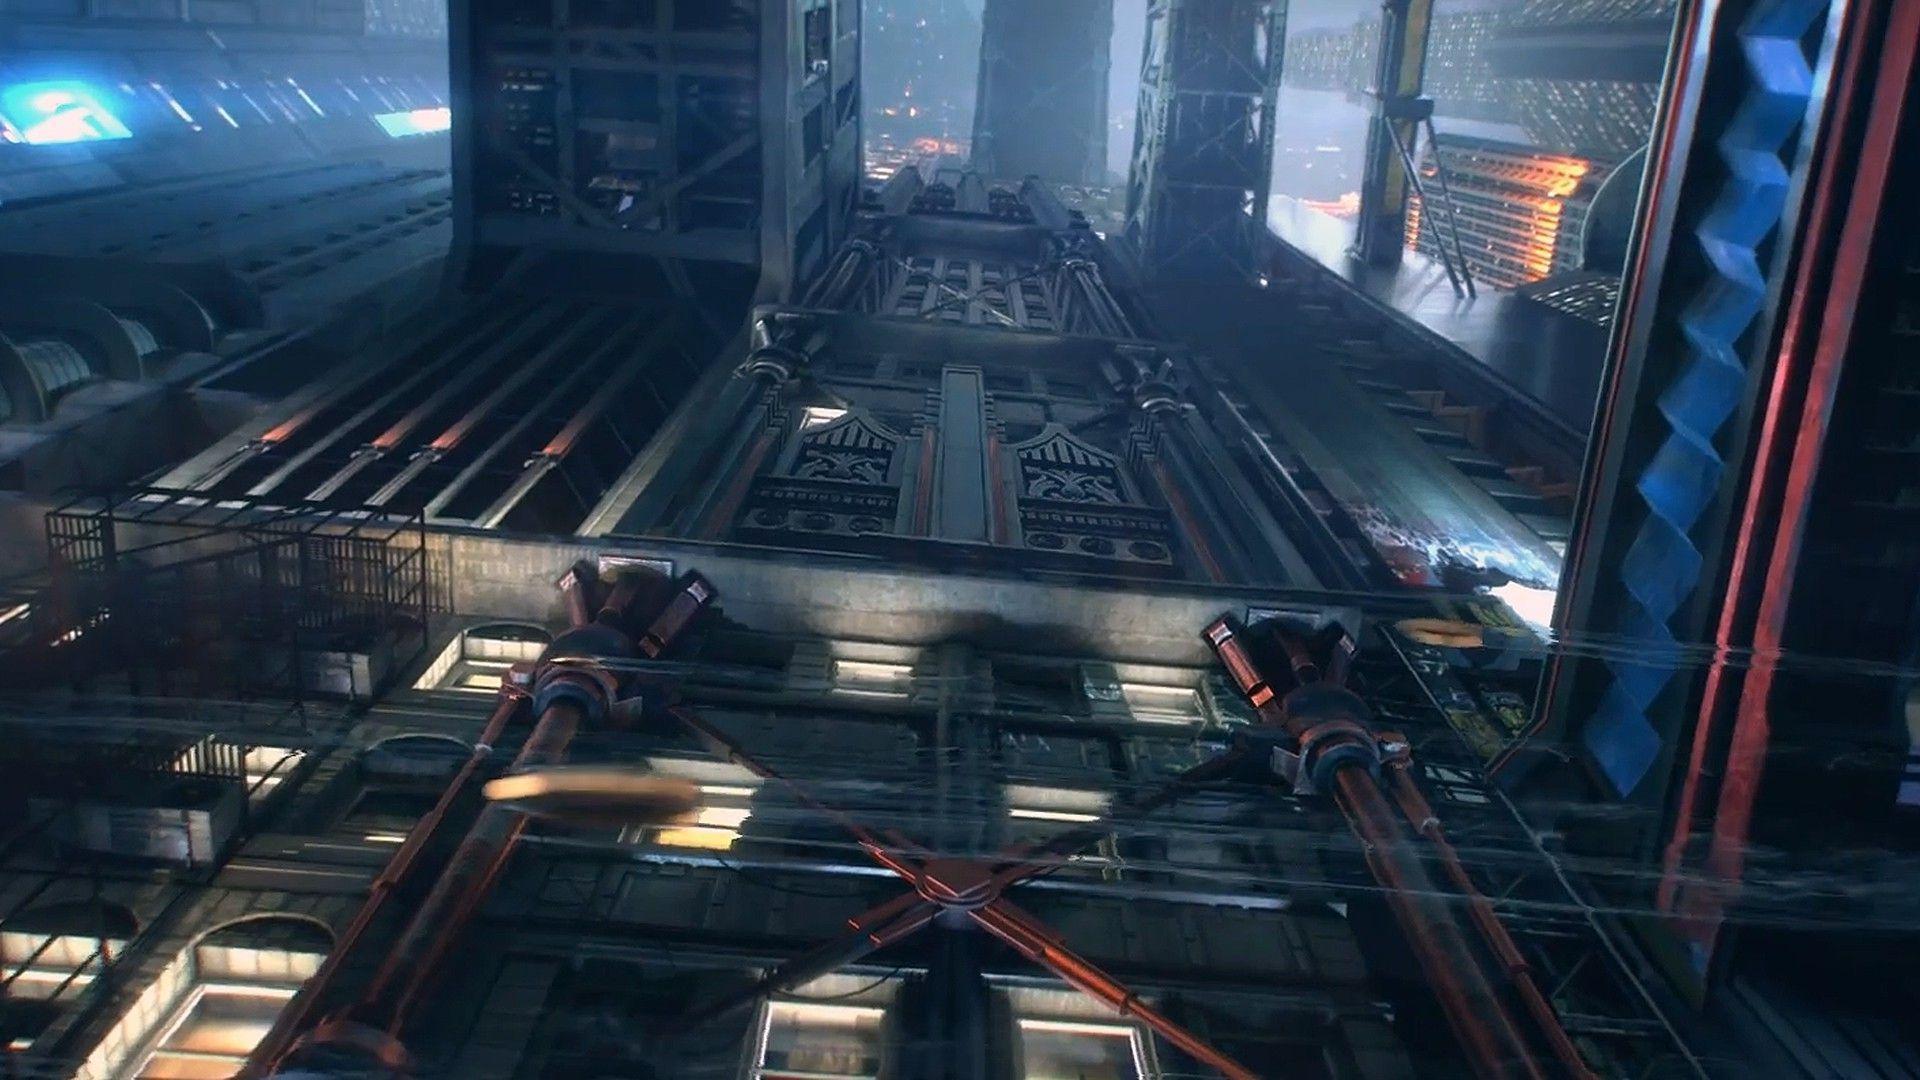 cyberpunk city hd wallpapers - photo #30